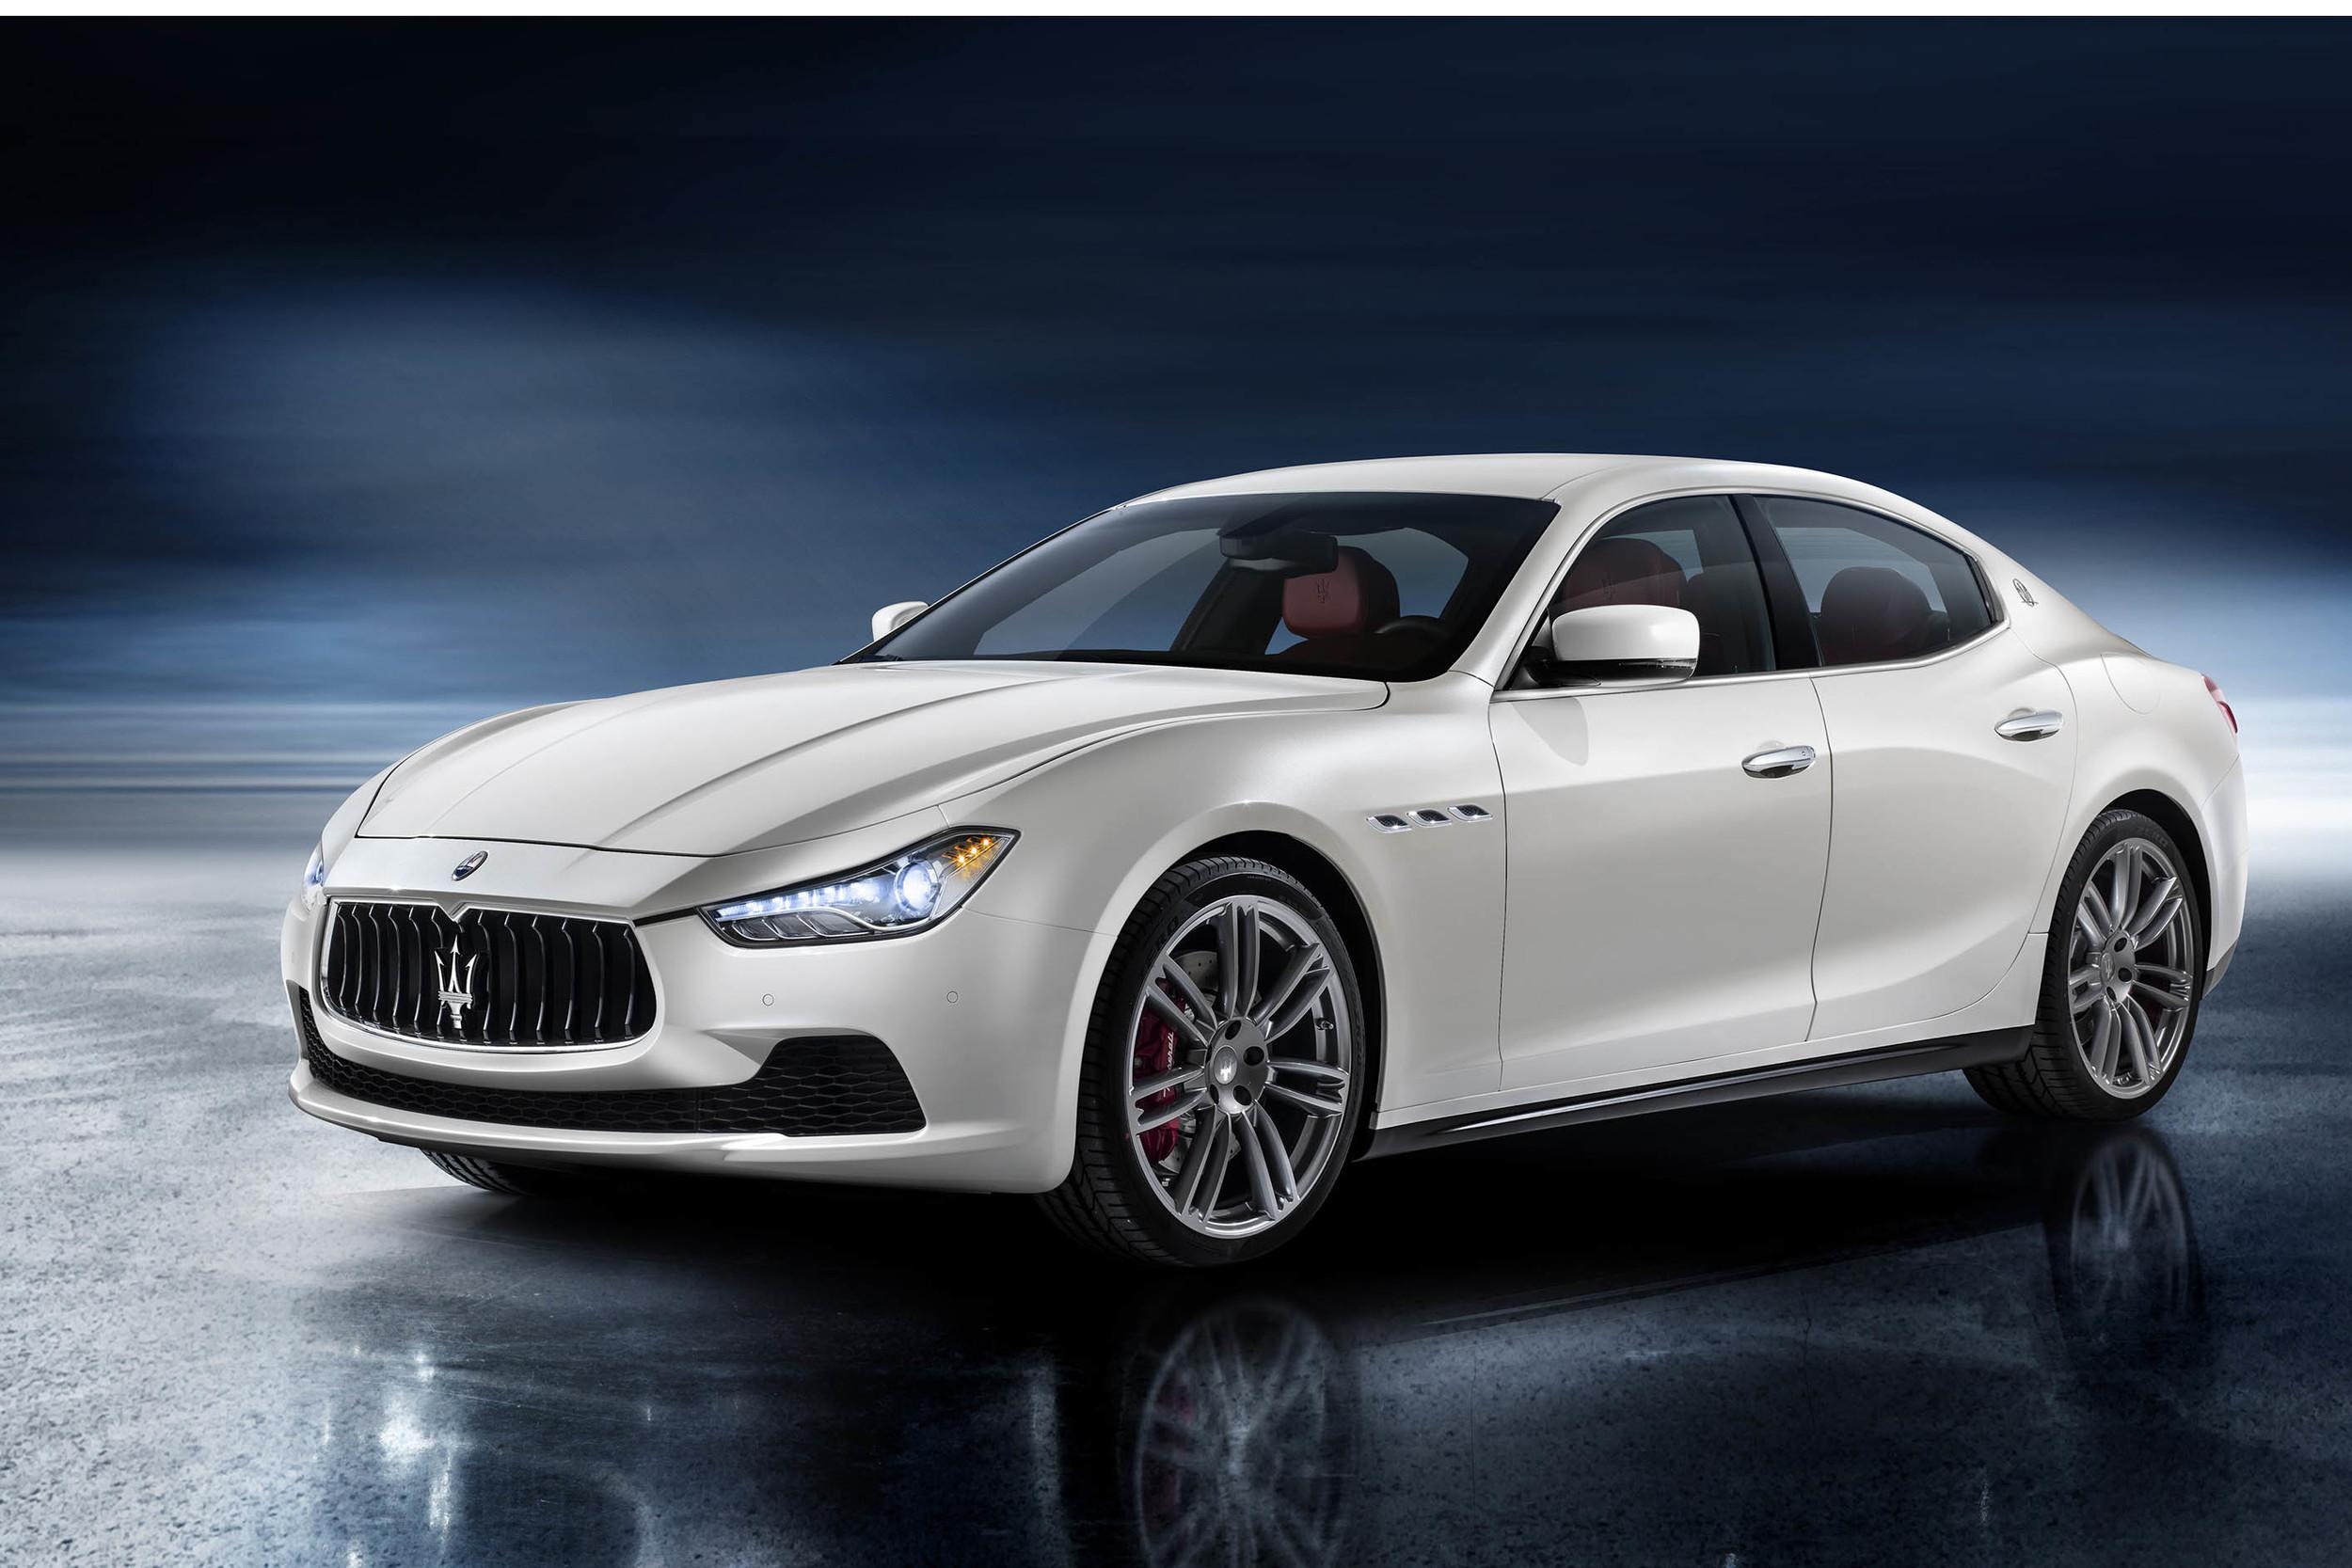 Maserati Ghibli. Source: maserati.com